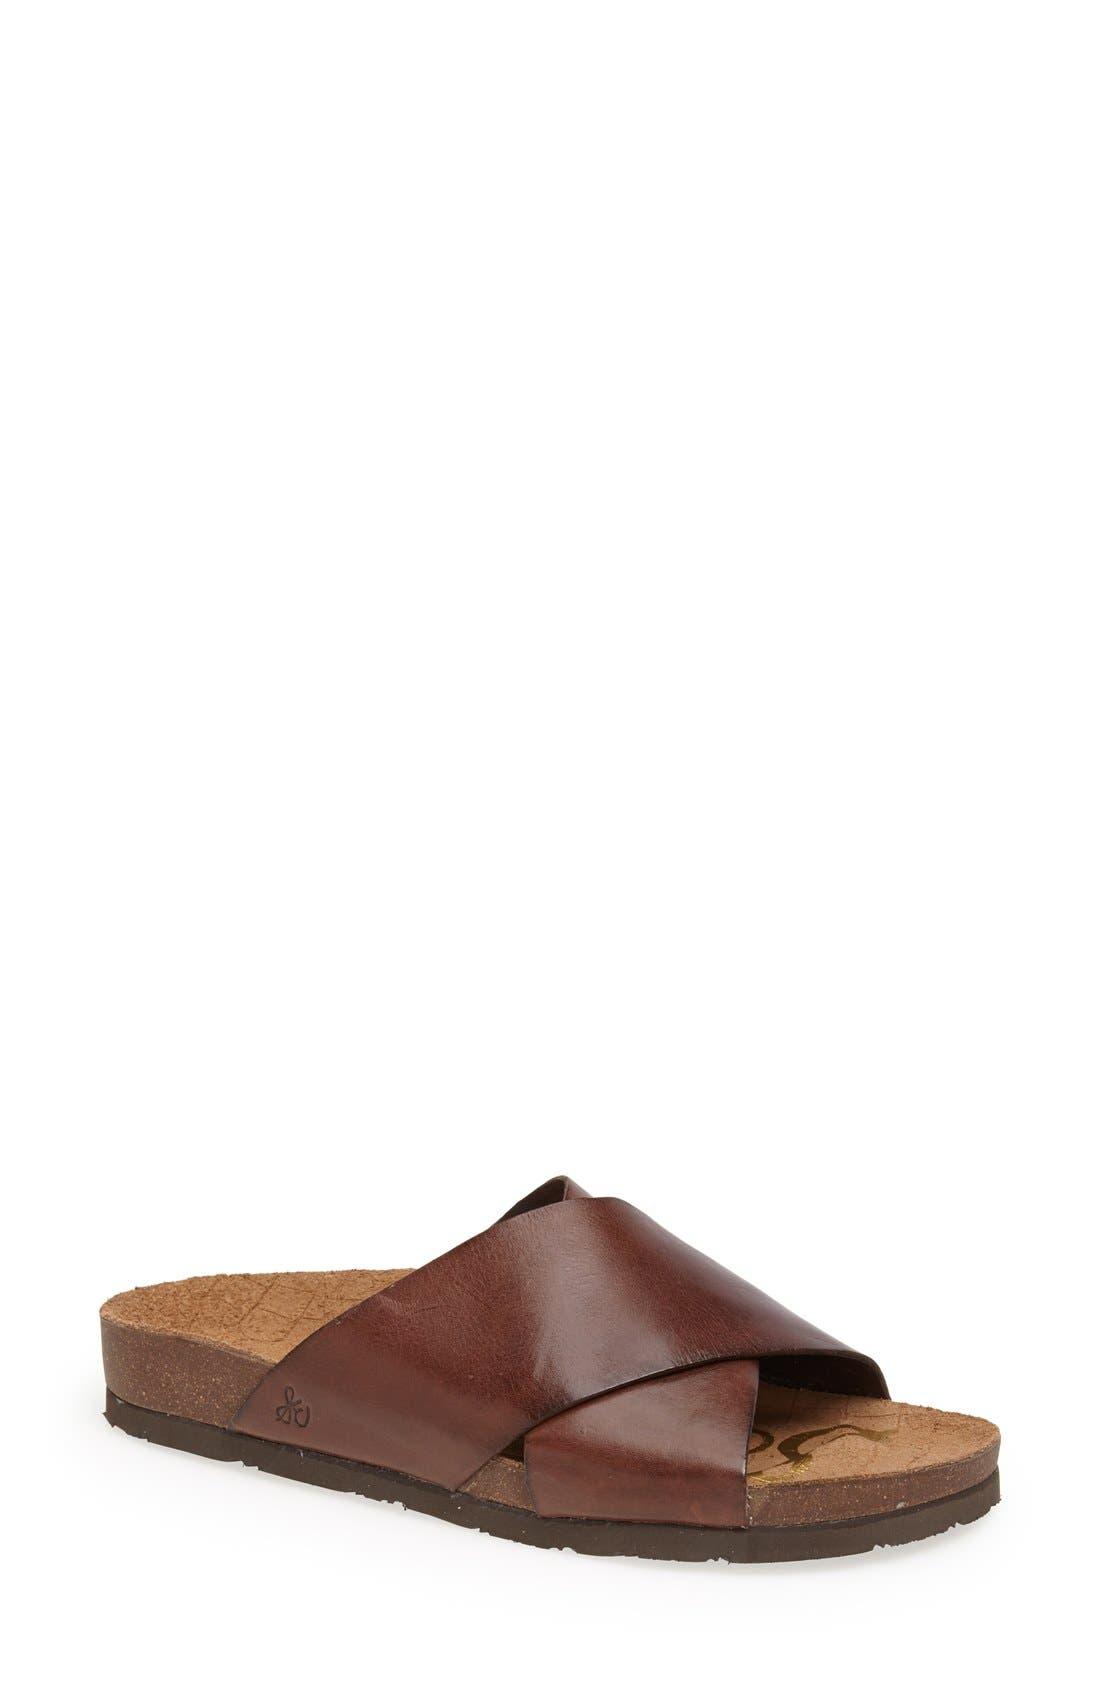 'Adora' Sandal,                             Main thumbnail 4, color,